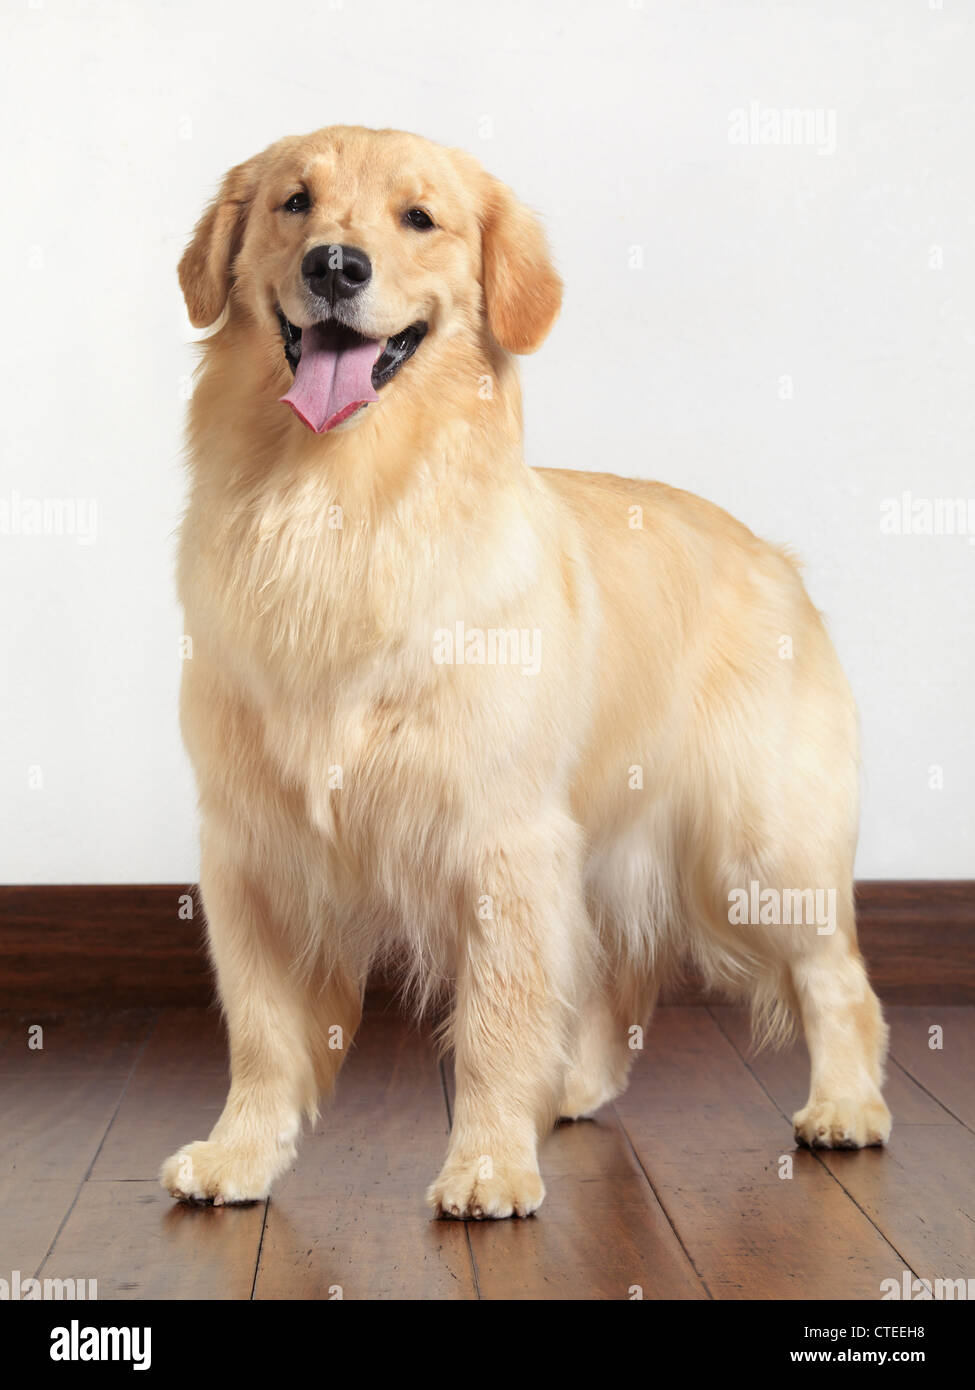 Golden Retriever retrato interior. Quince meses de perro viejo. Imagen De Stock